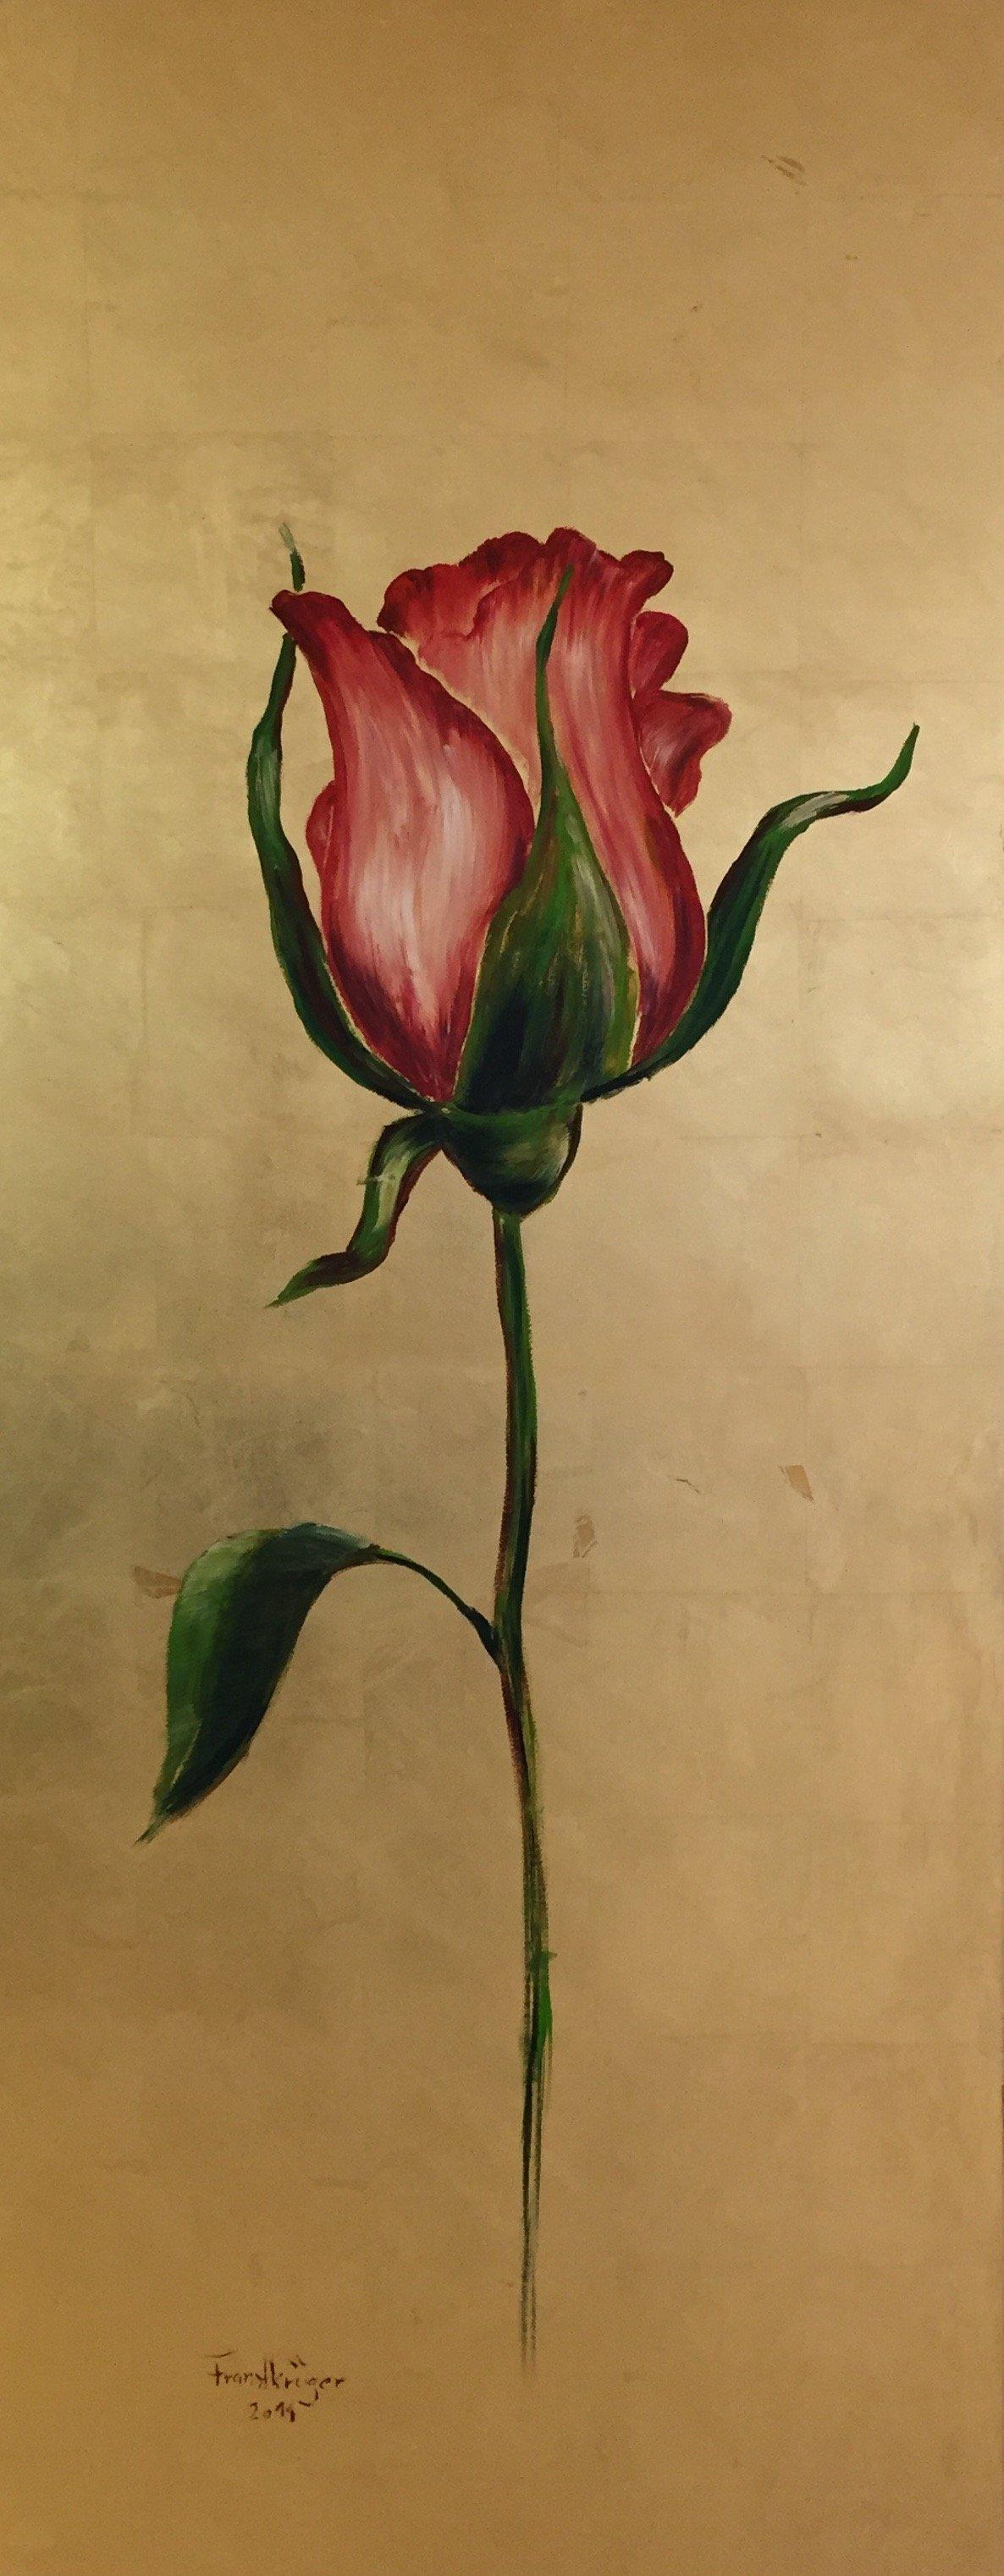 Rosa de Oro II